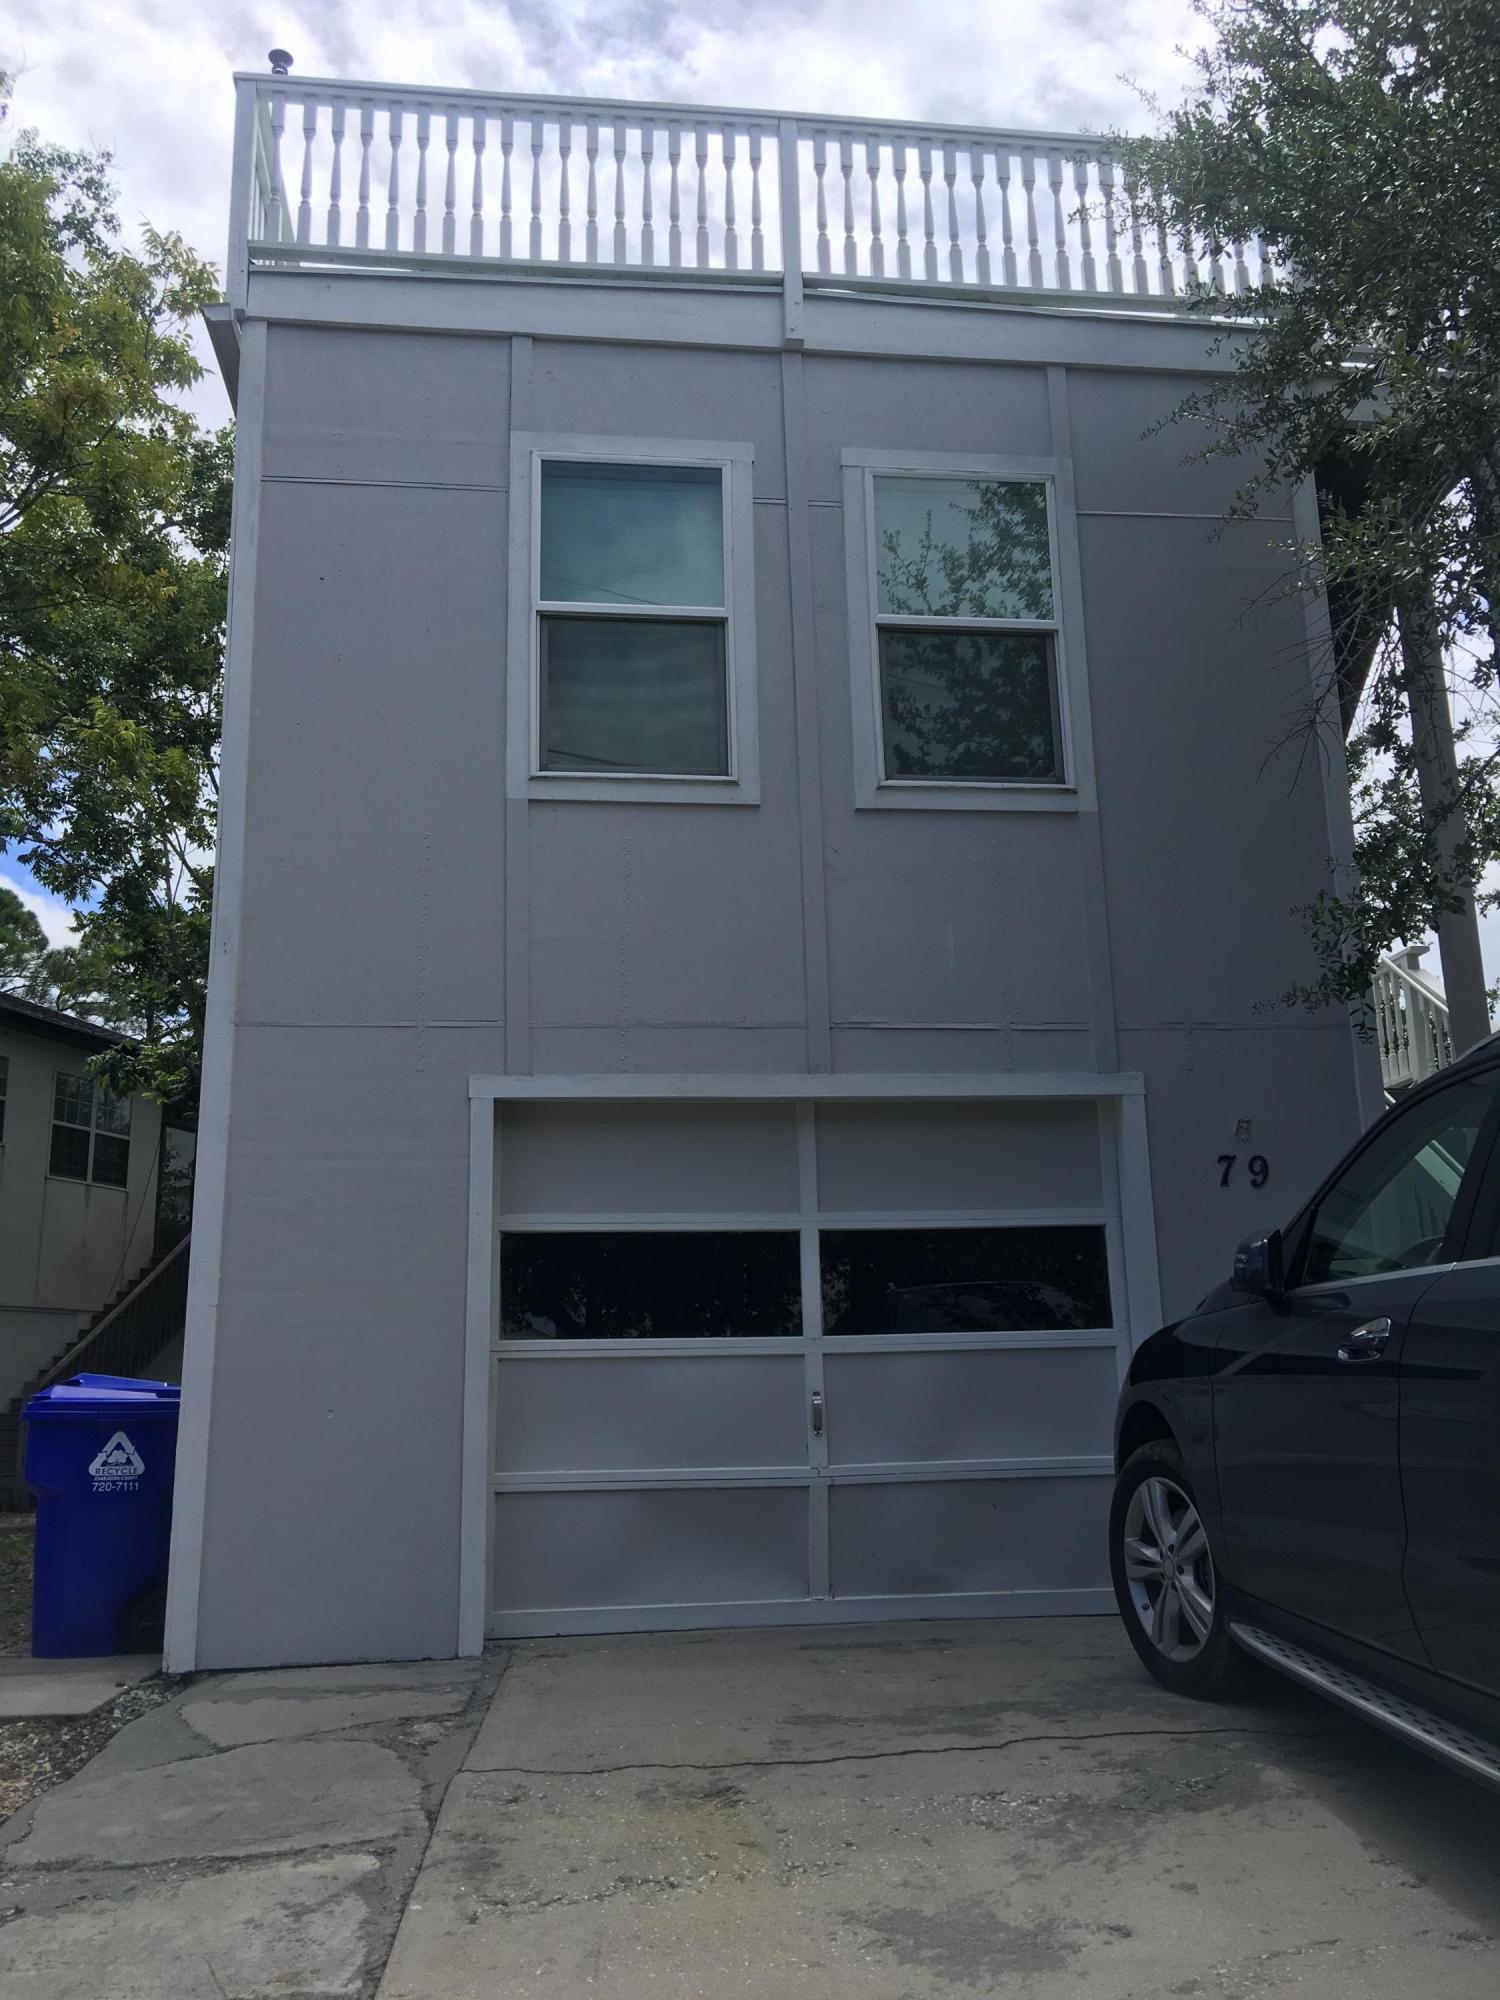 None Homes For Sale - 79 Sandbar, Folly Beach, SC - 11